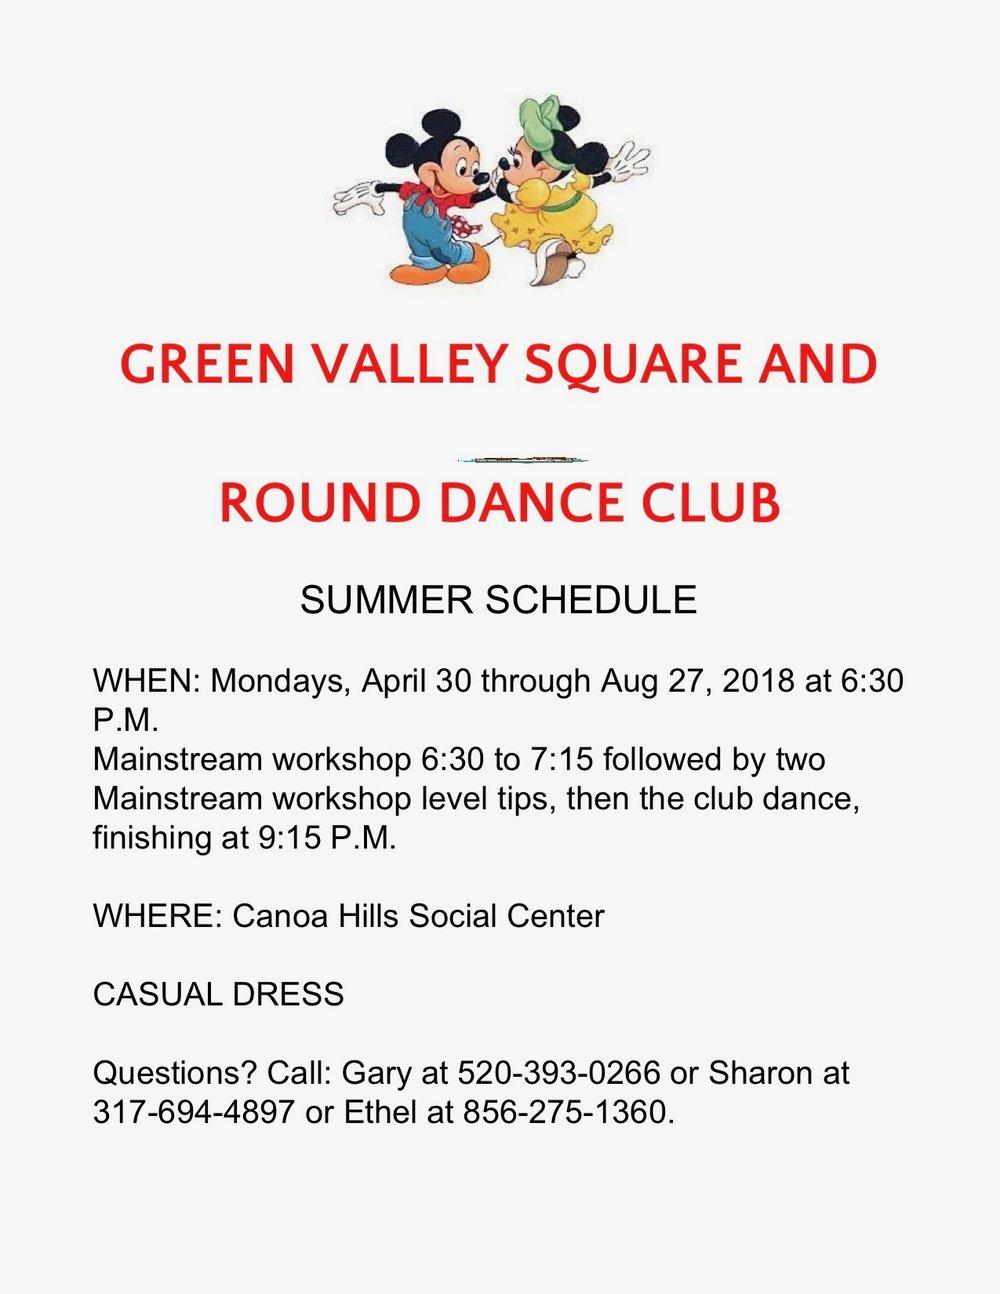 GVS Summer 2018 Flyer.odt.jpg